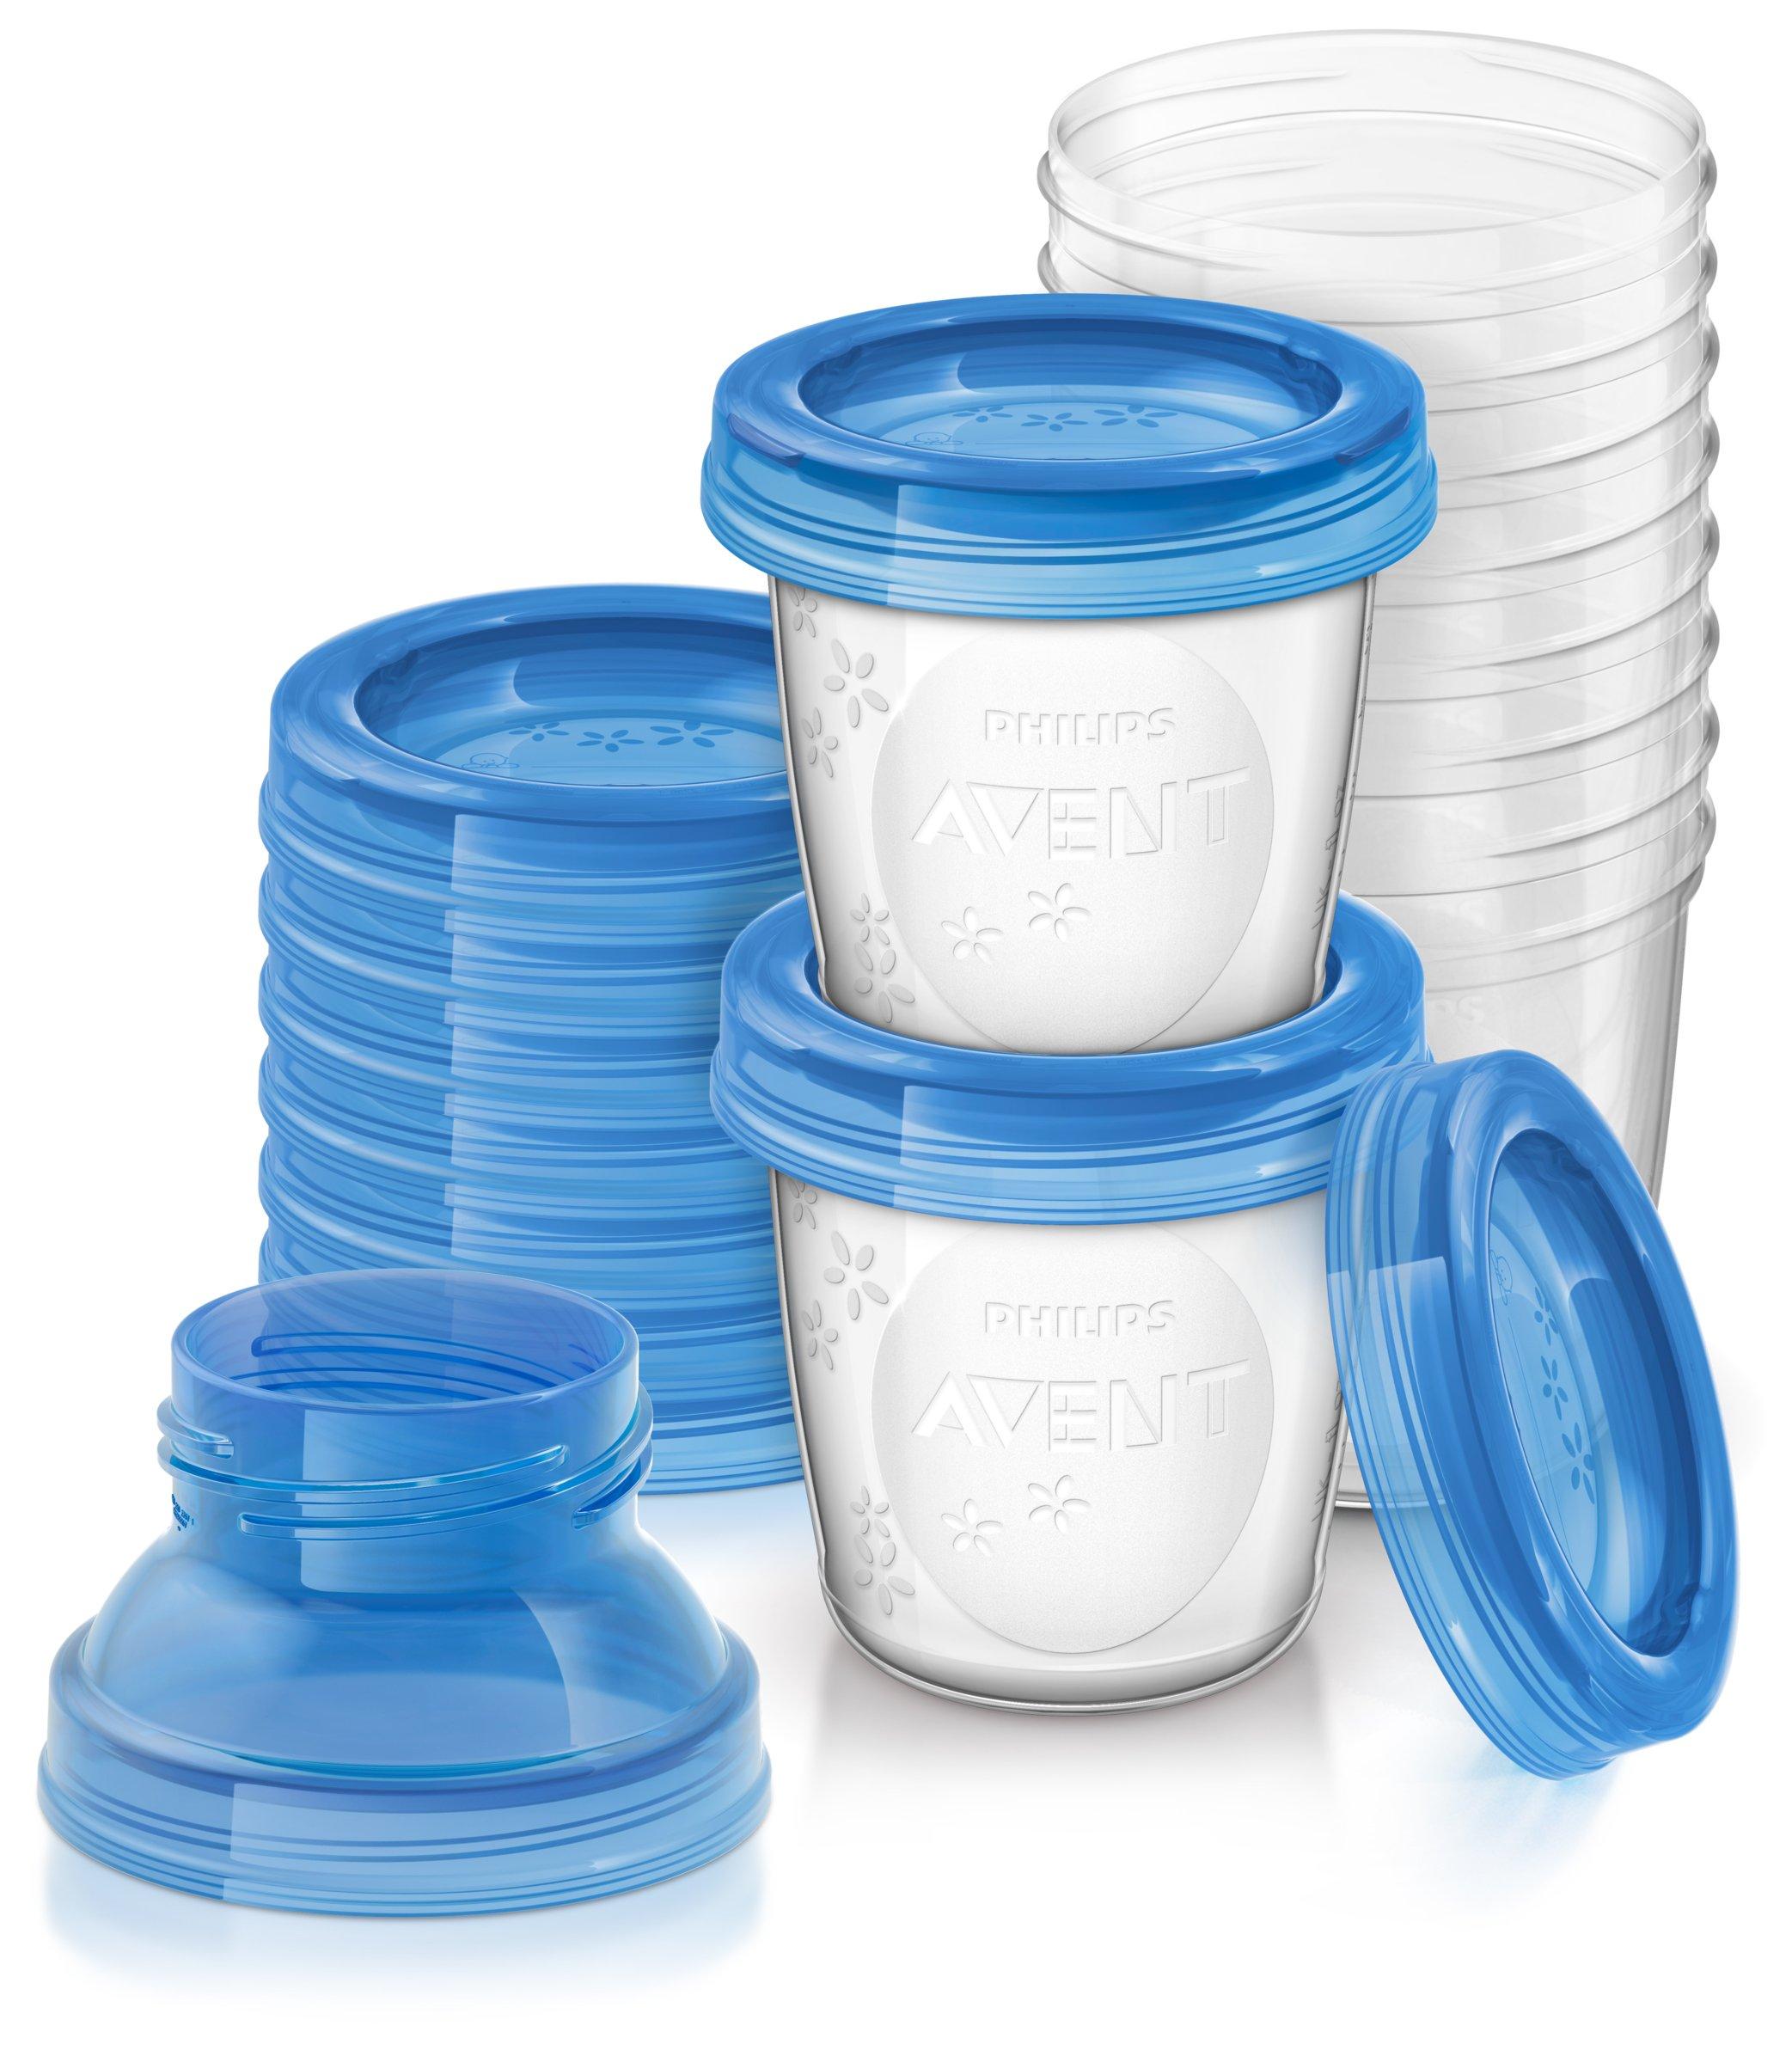 Philips Avent Reusable Breast Milk Storage Cups, Pack of 10, SCF618/10